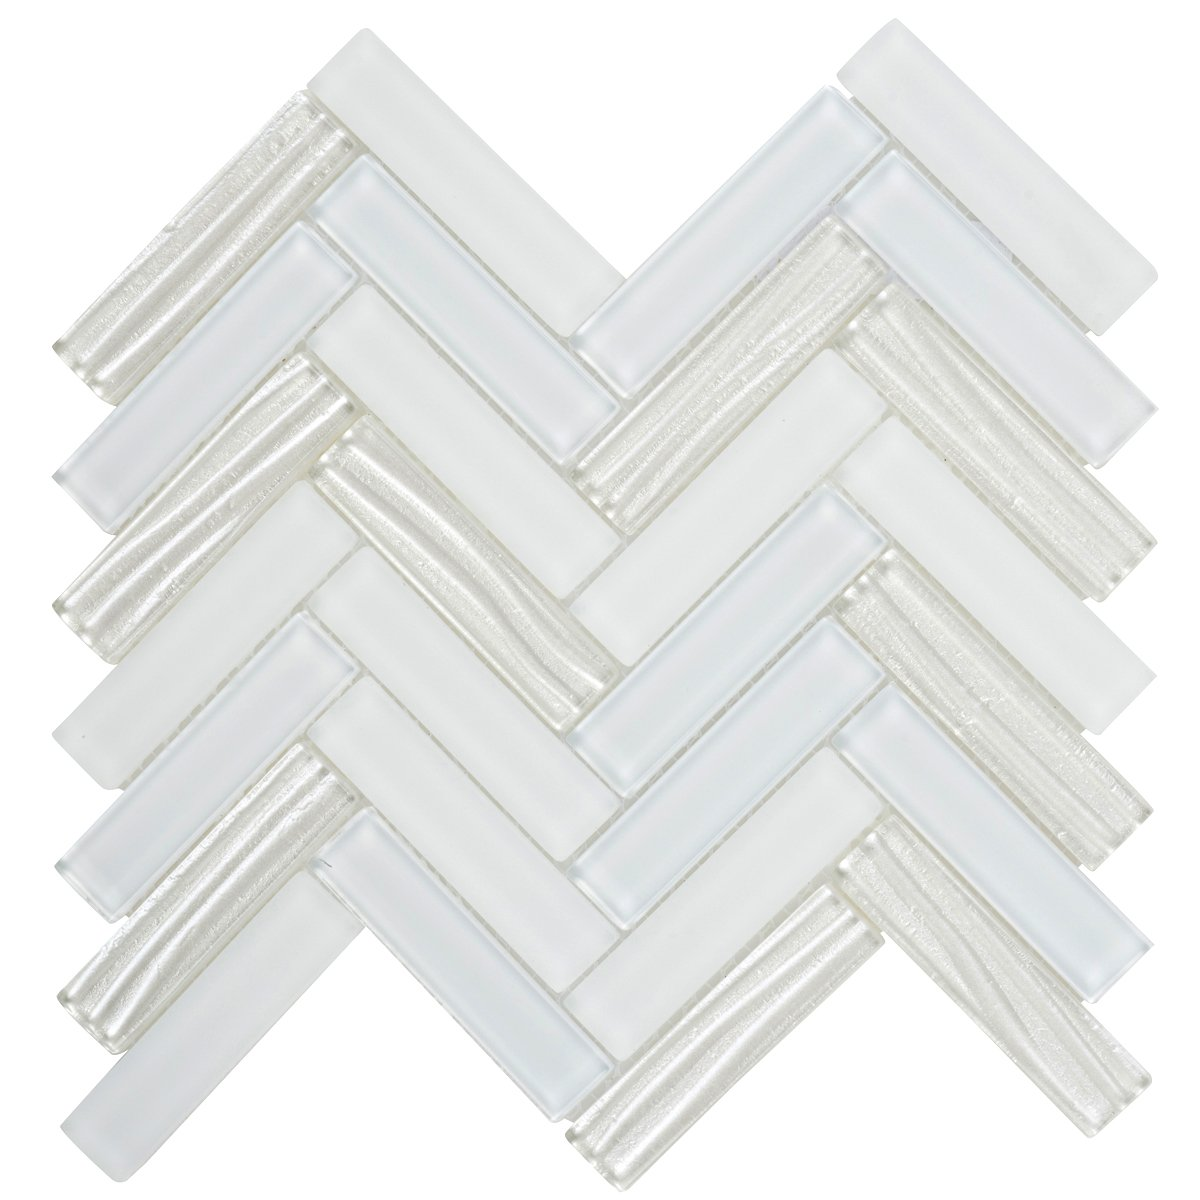 Modket TDH103MO Super White Crystal Glass Mosaic Tile, Metallic Wave Cold Spray, Matte Blended Herringbone Pattern Backsplash